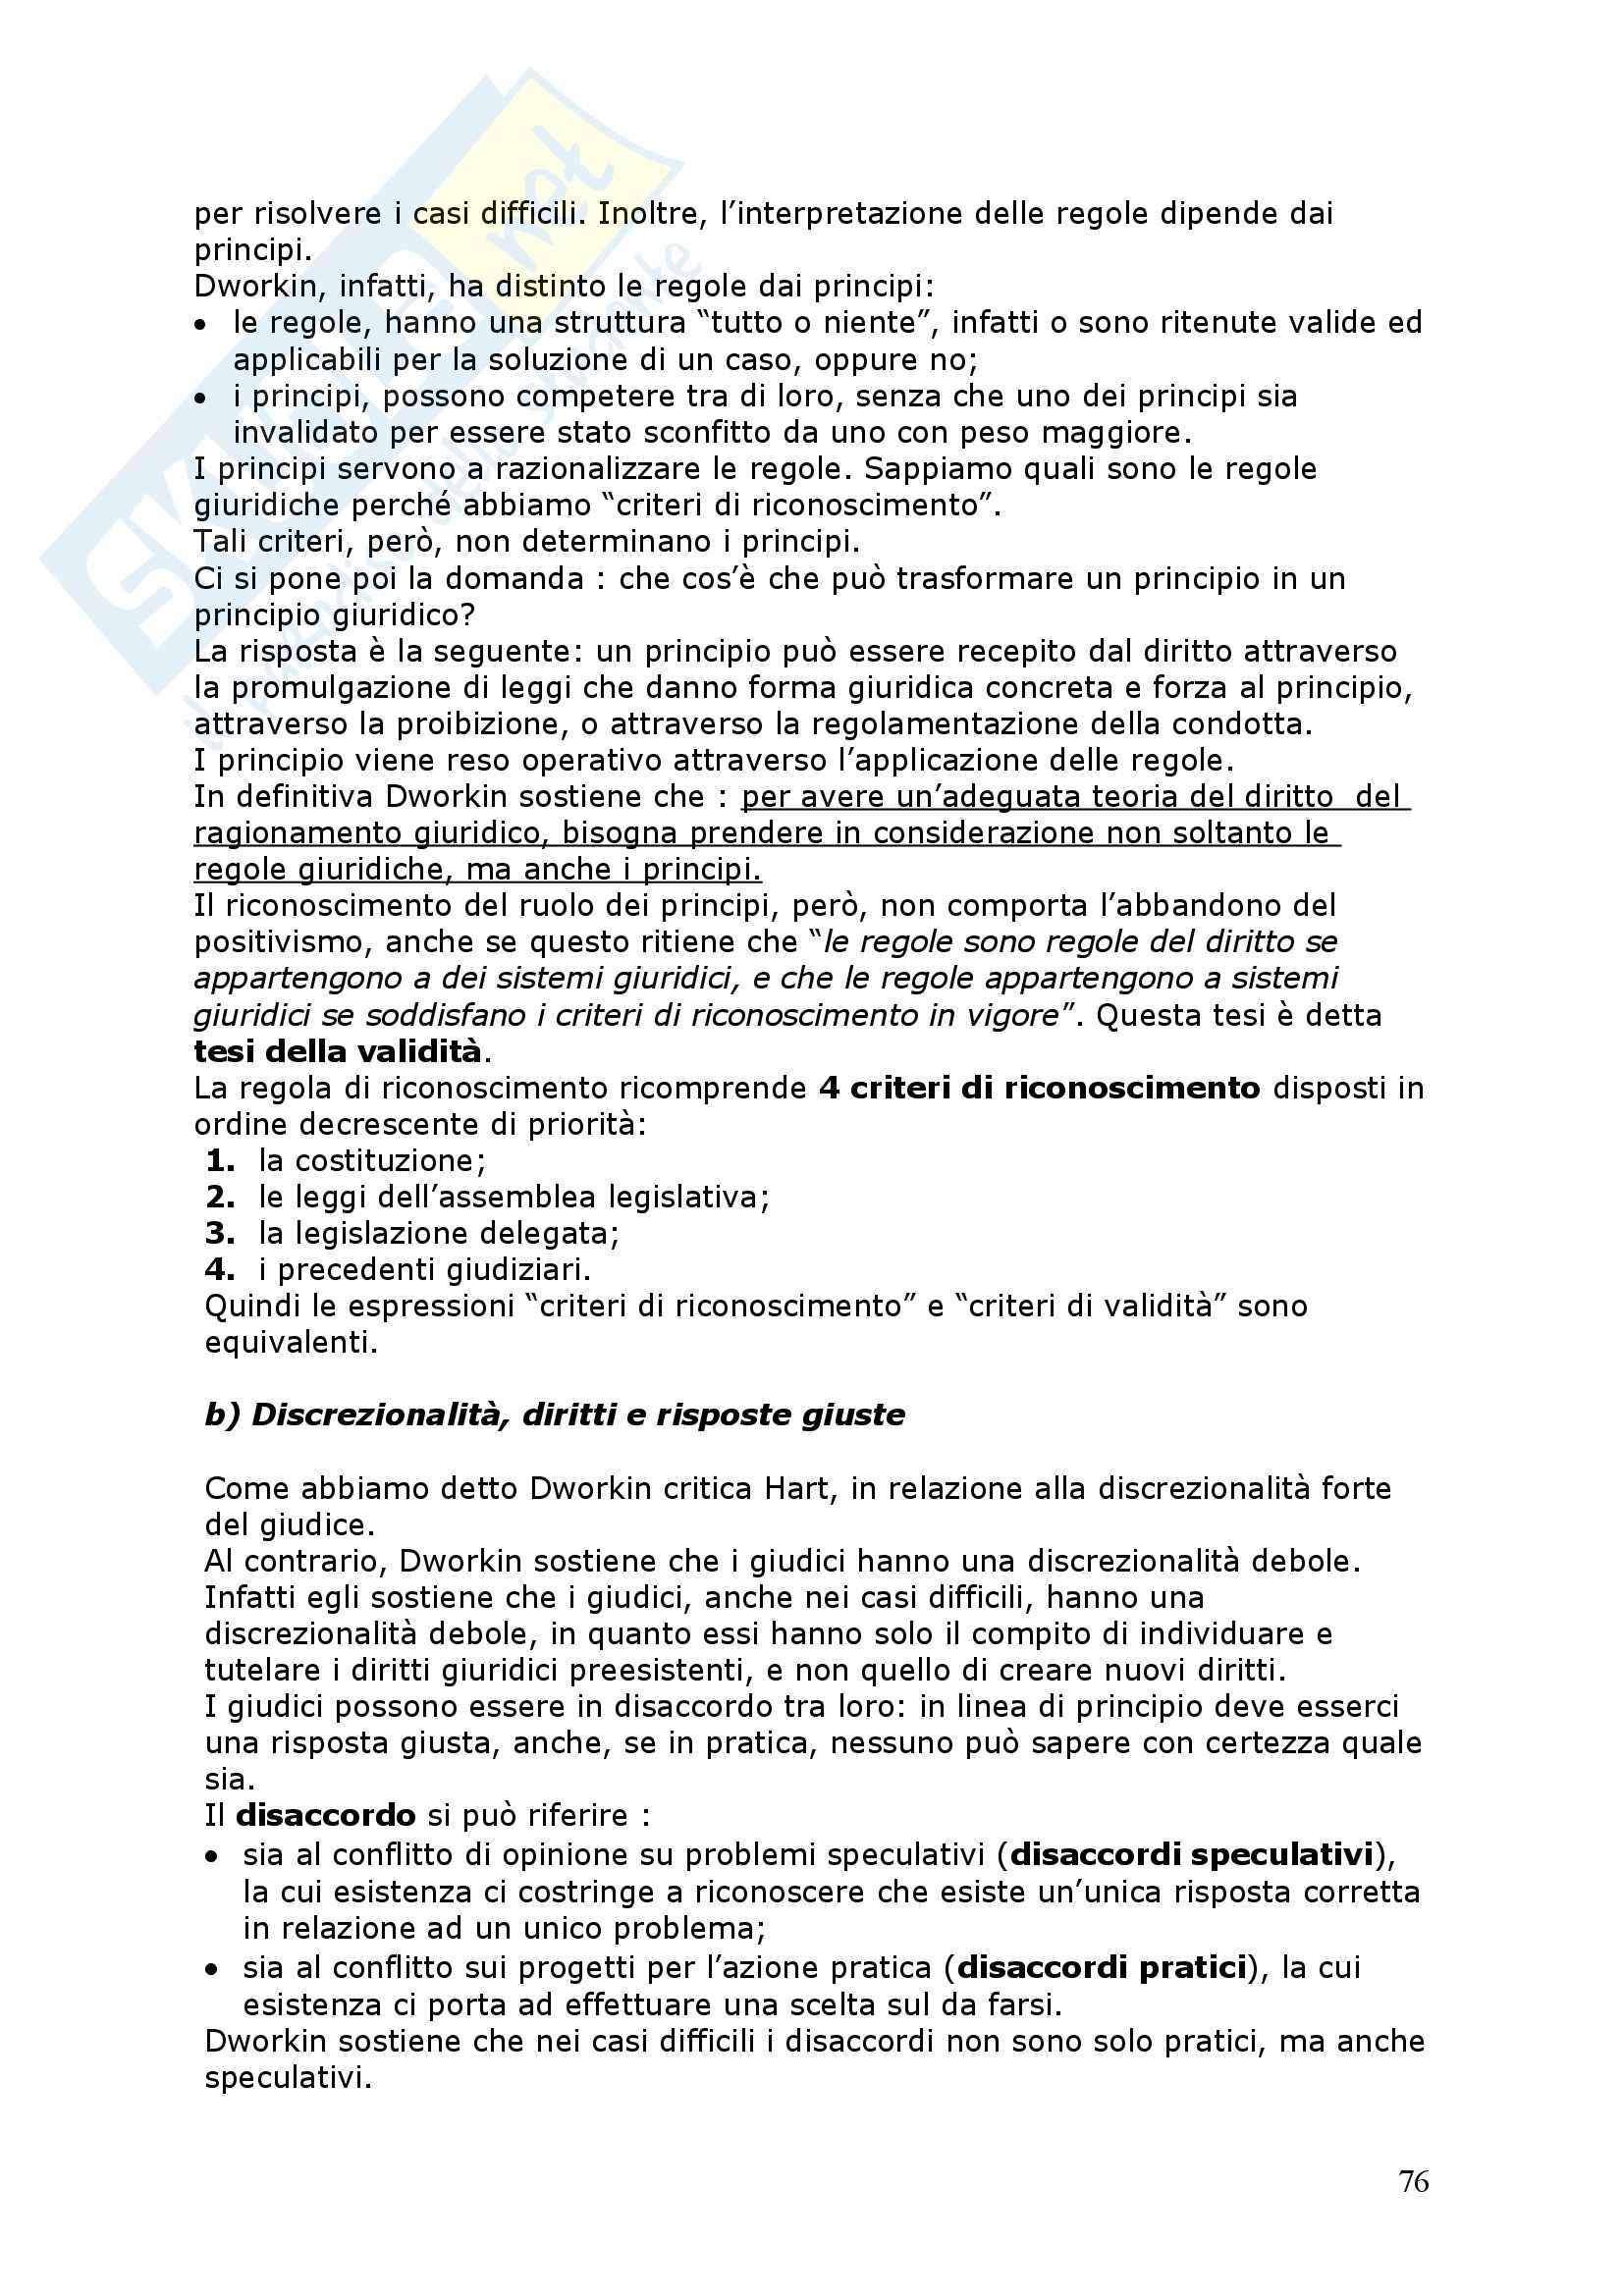 Positivismo giuridico ed ermeneutica filosofica Pag. 76